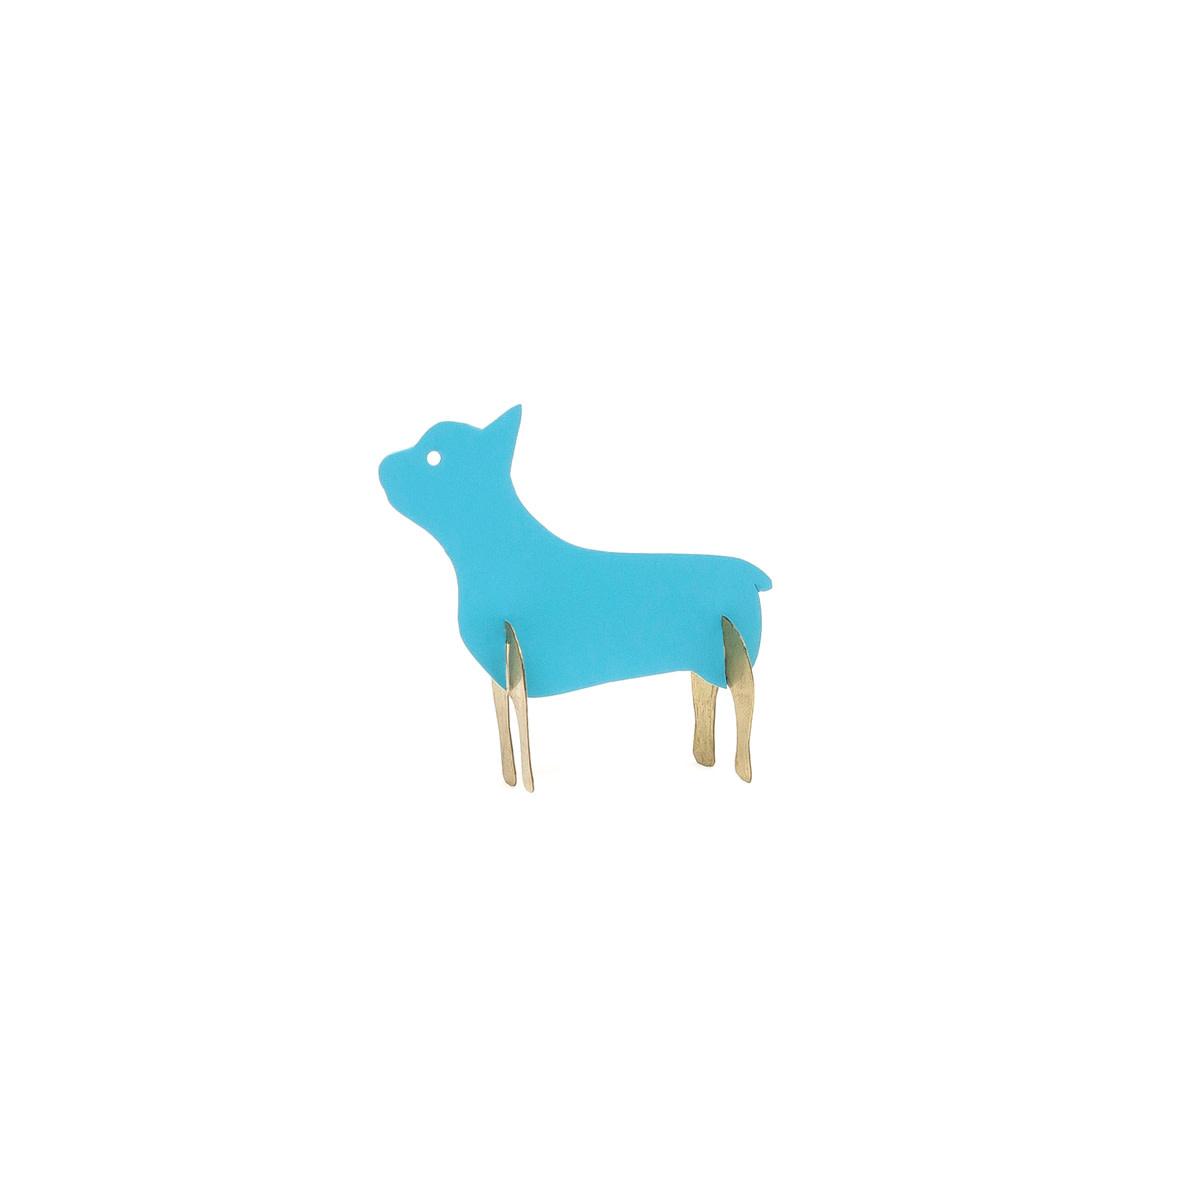 Sibilia Hand Painted Brass Pug Sculpture